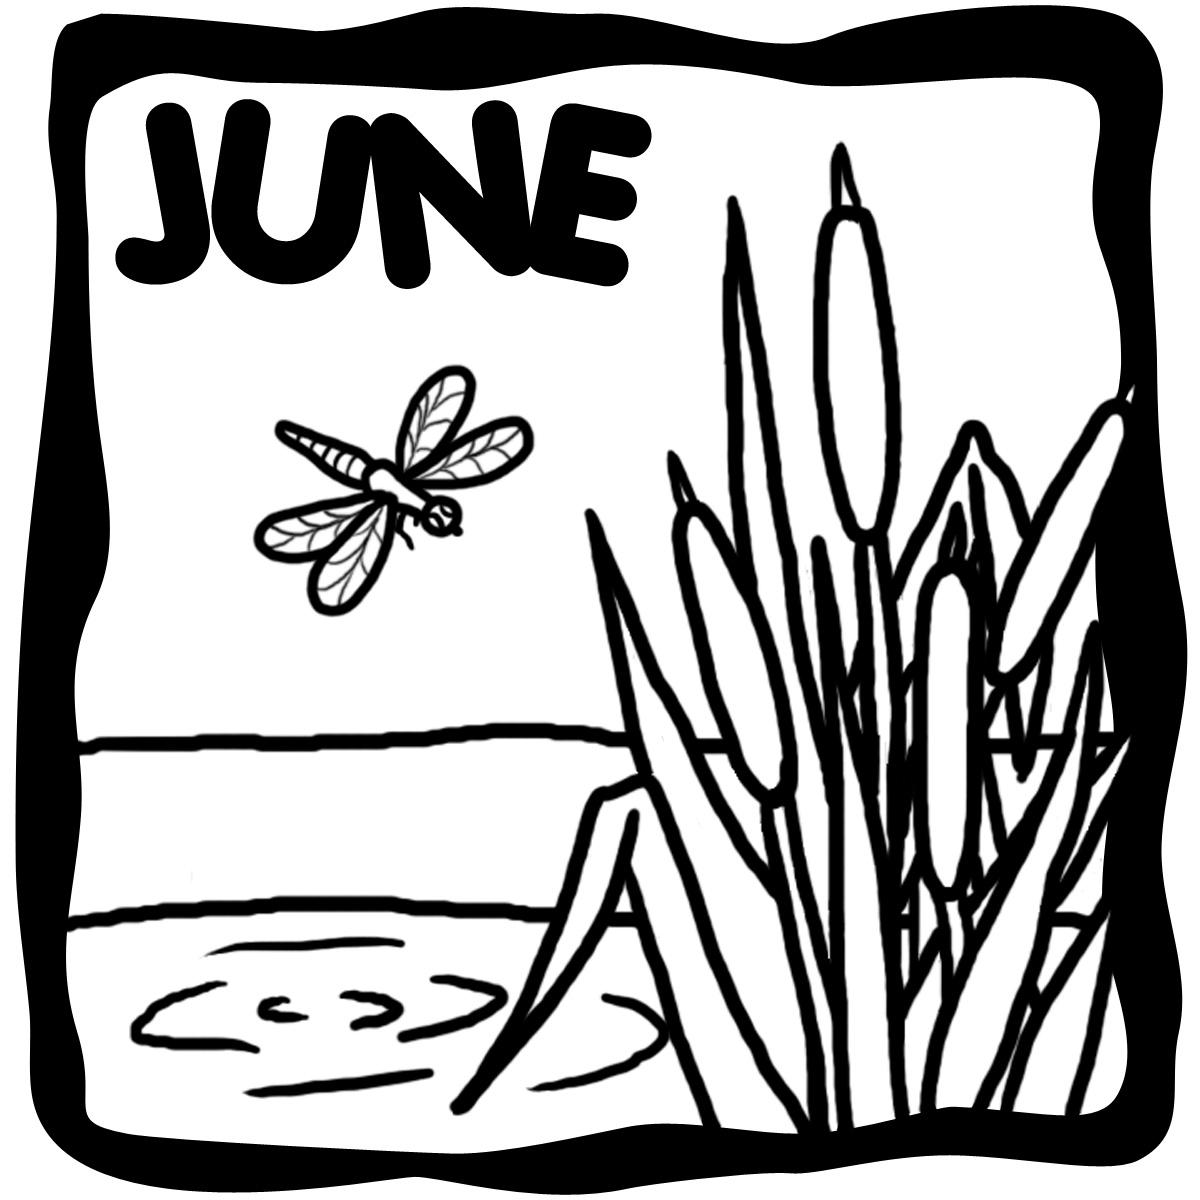 May calendar clipart summer png transparent library May calendar clipart summer - ClipartFest png transparent library